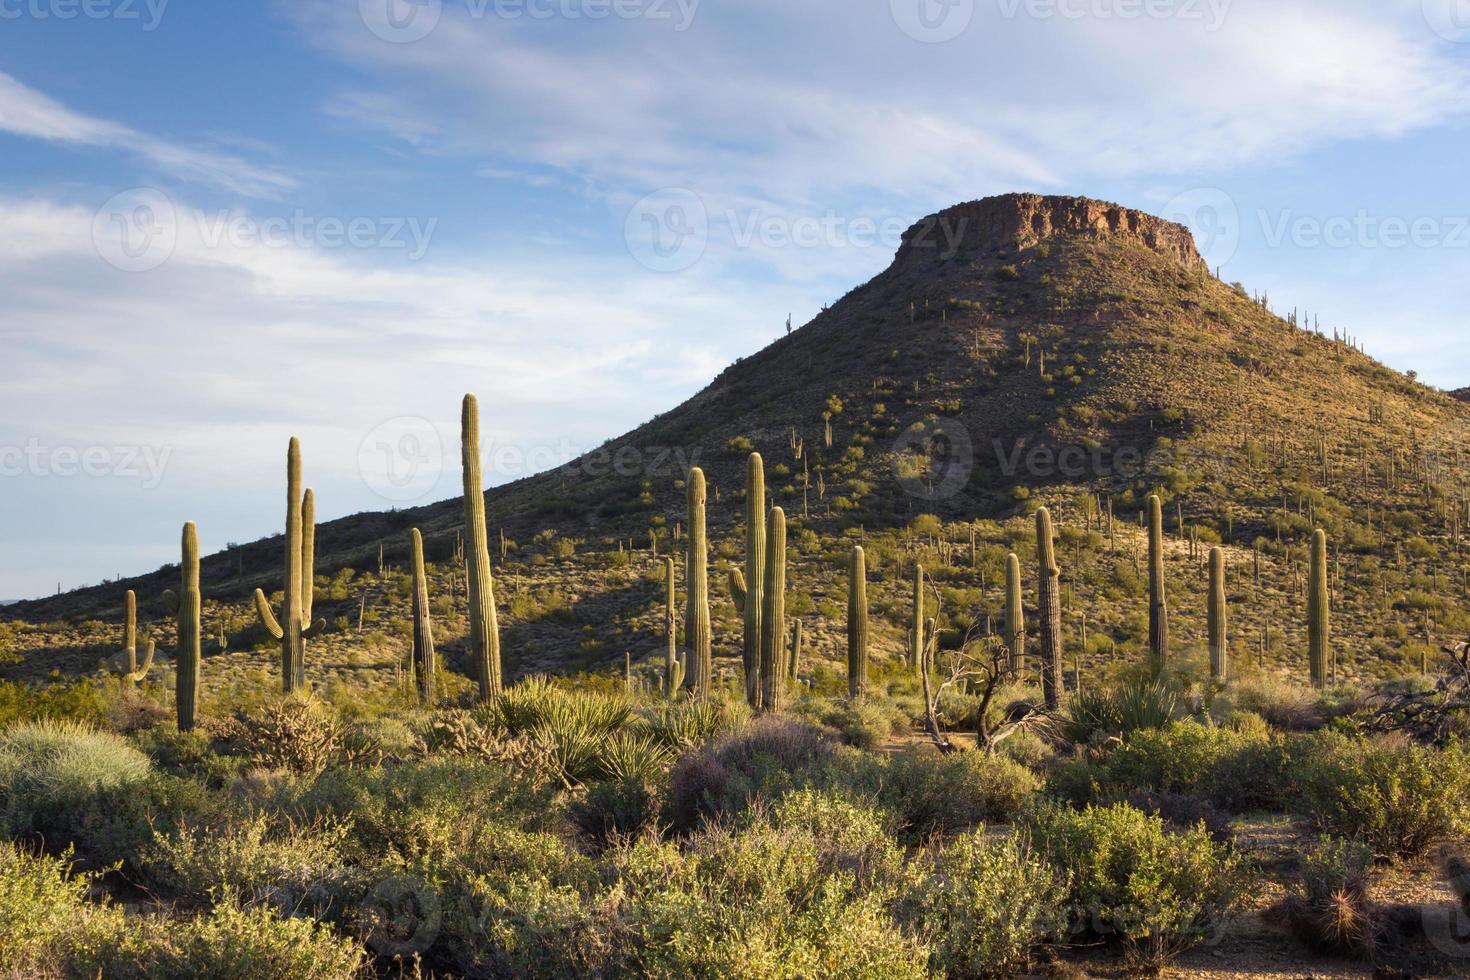 Morgenwüstenszene in Arizona foto